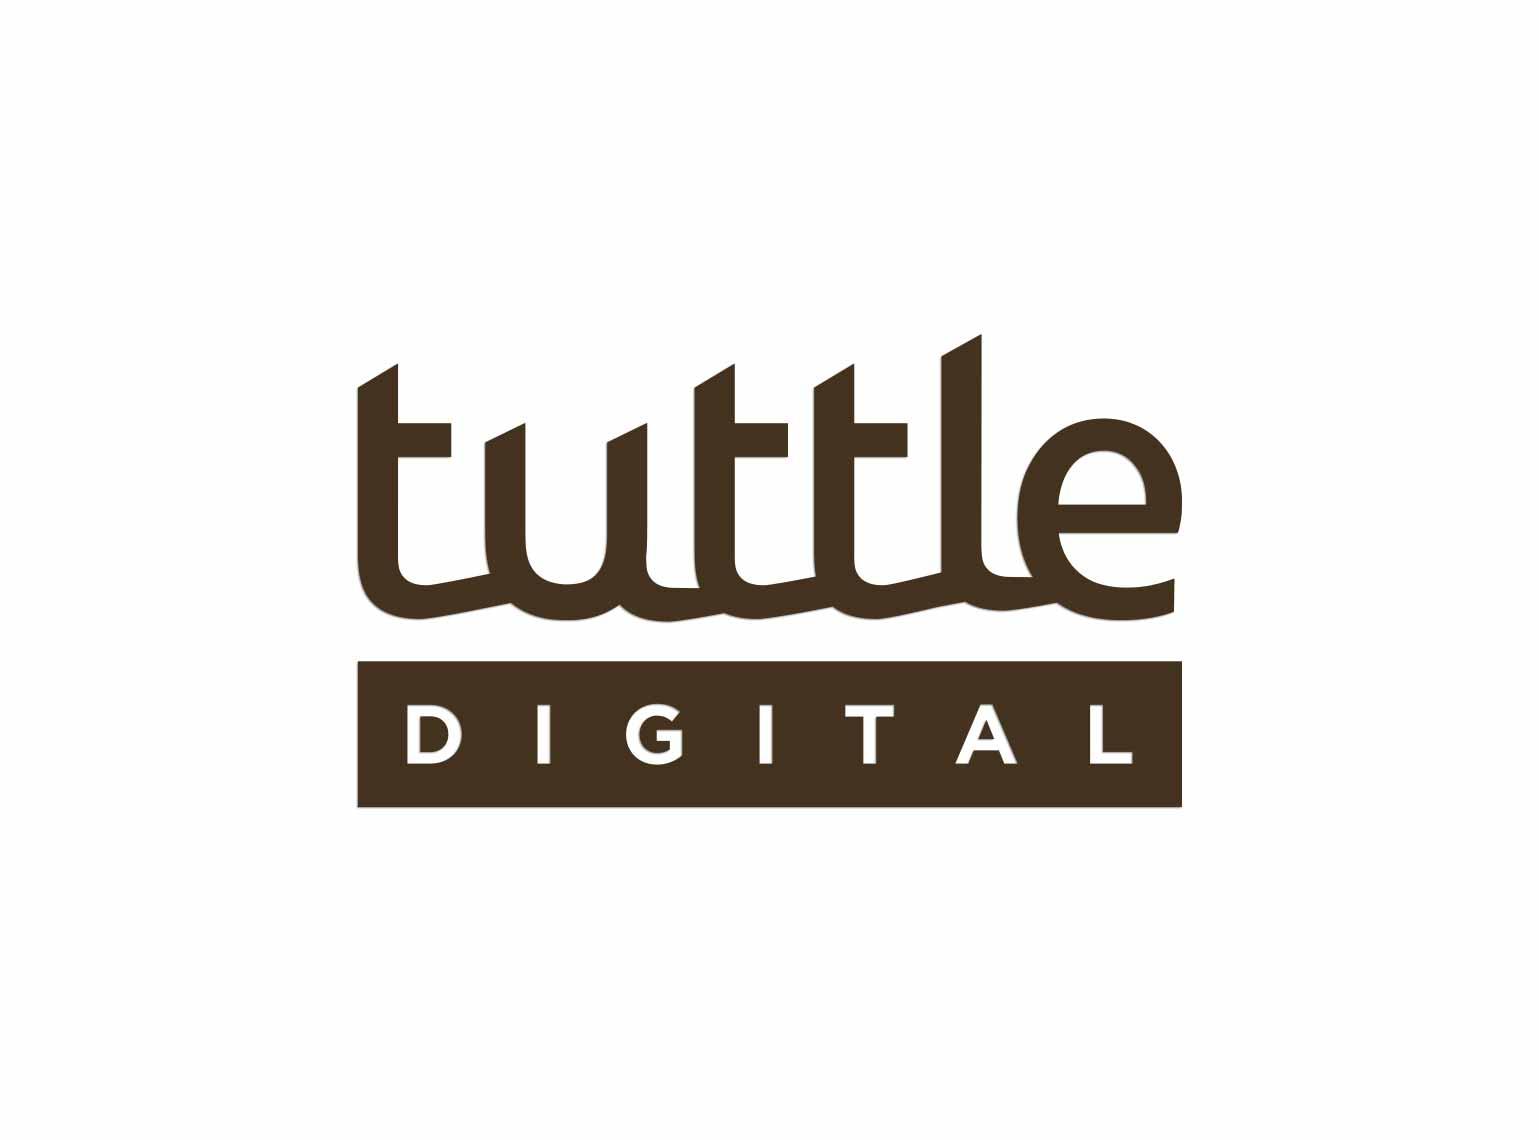 Tuttle Digital 01 – Kural Design